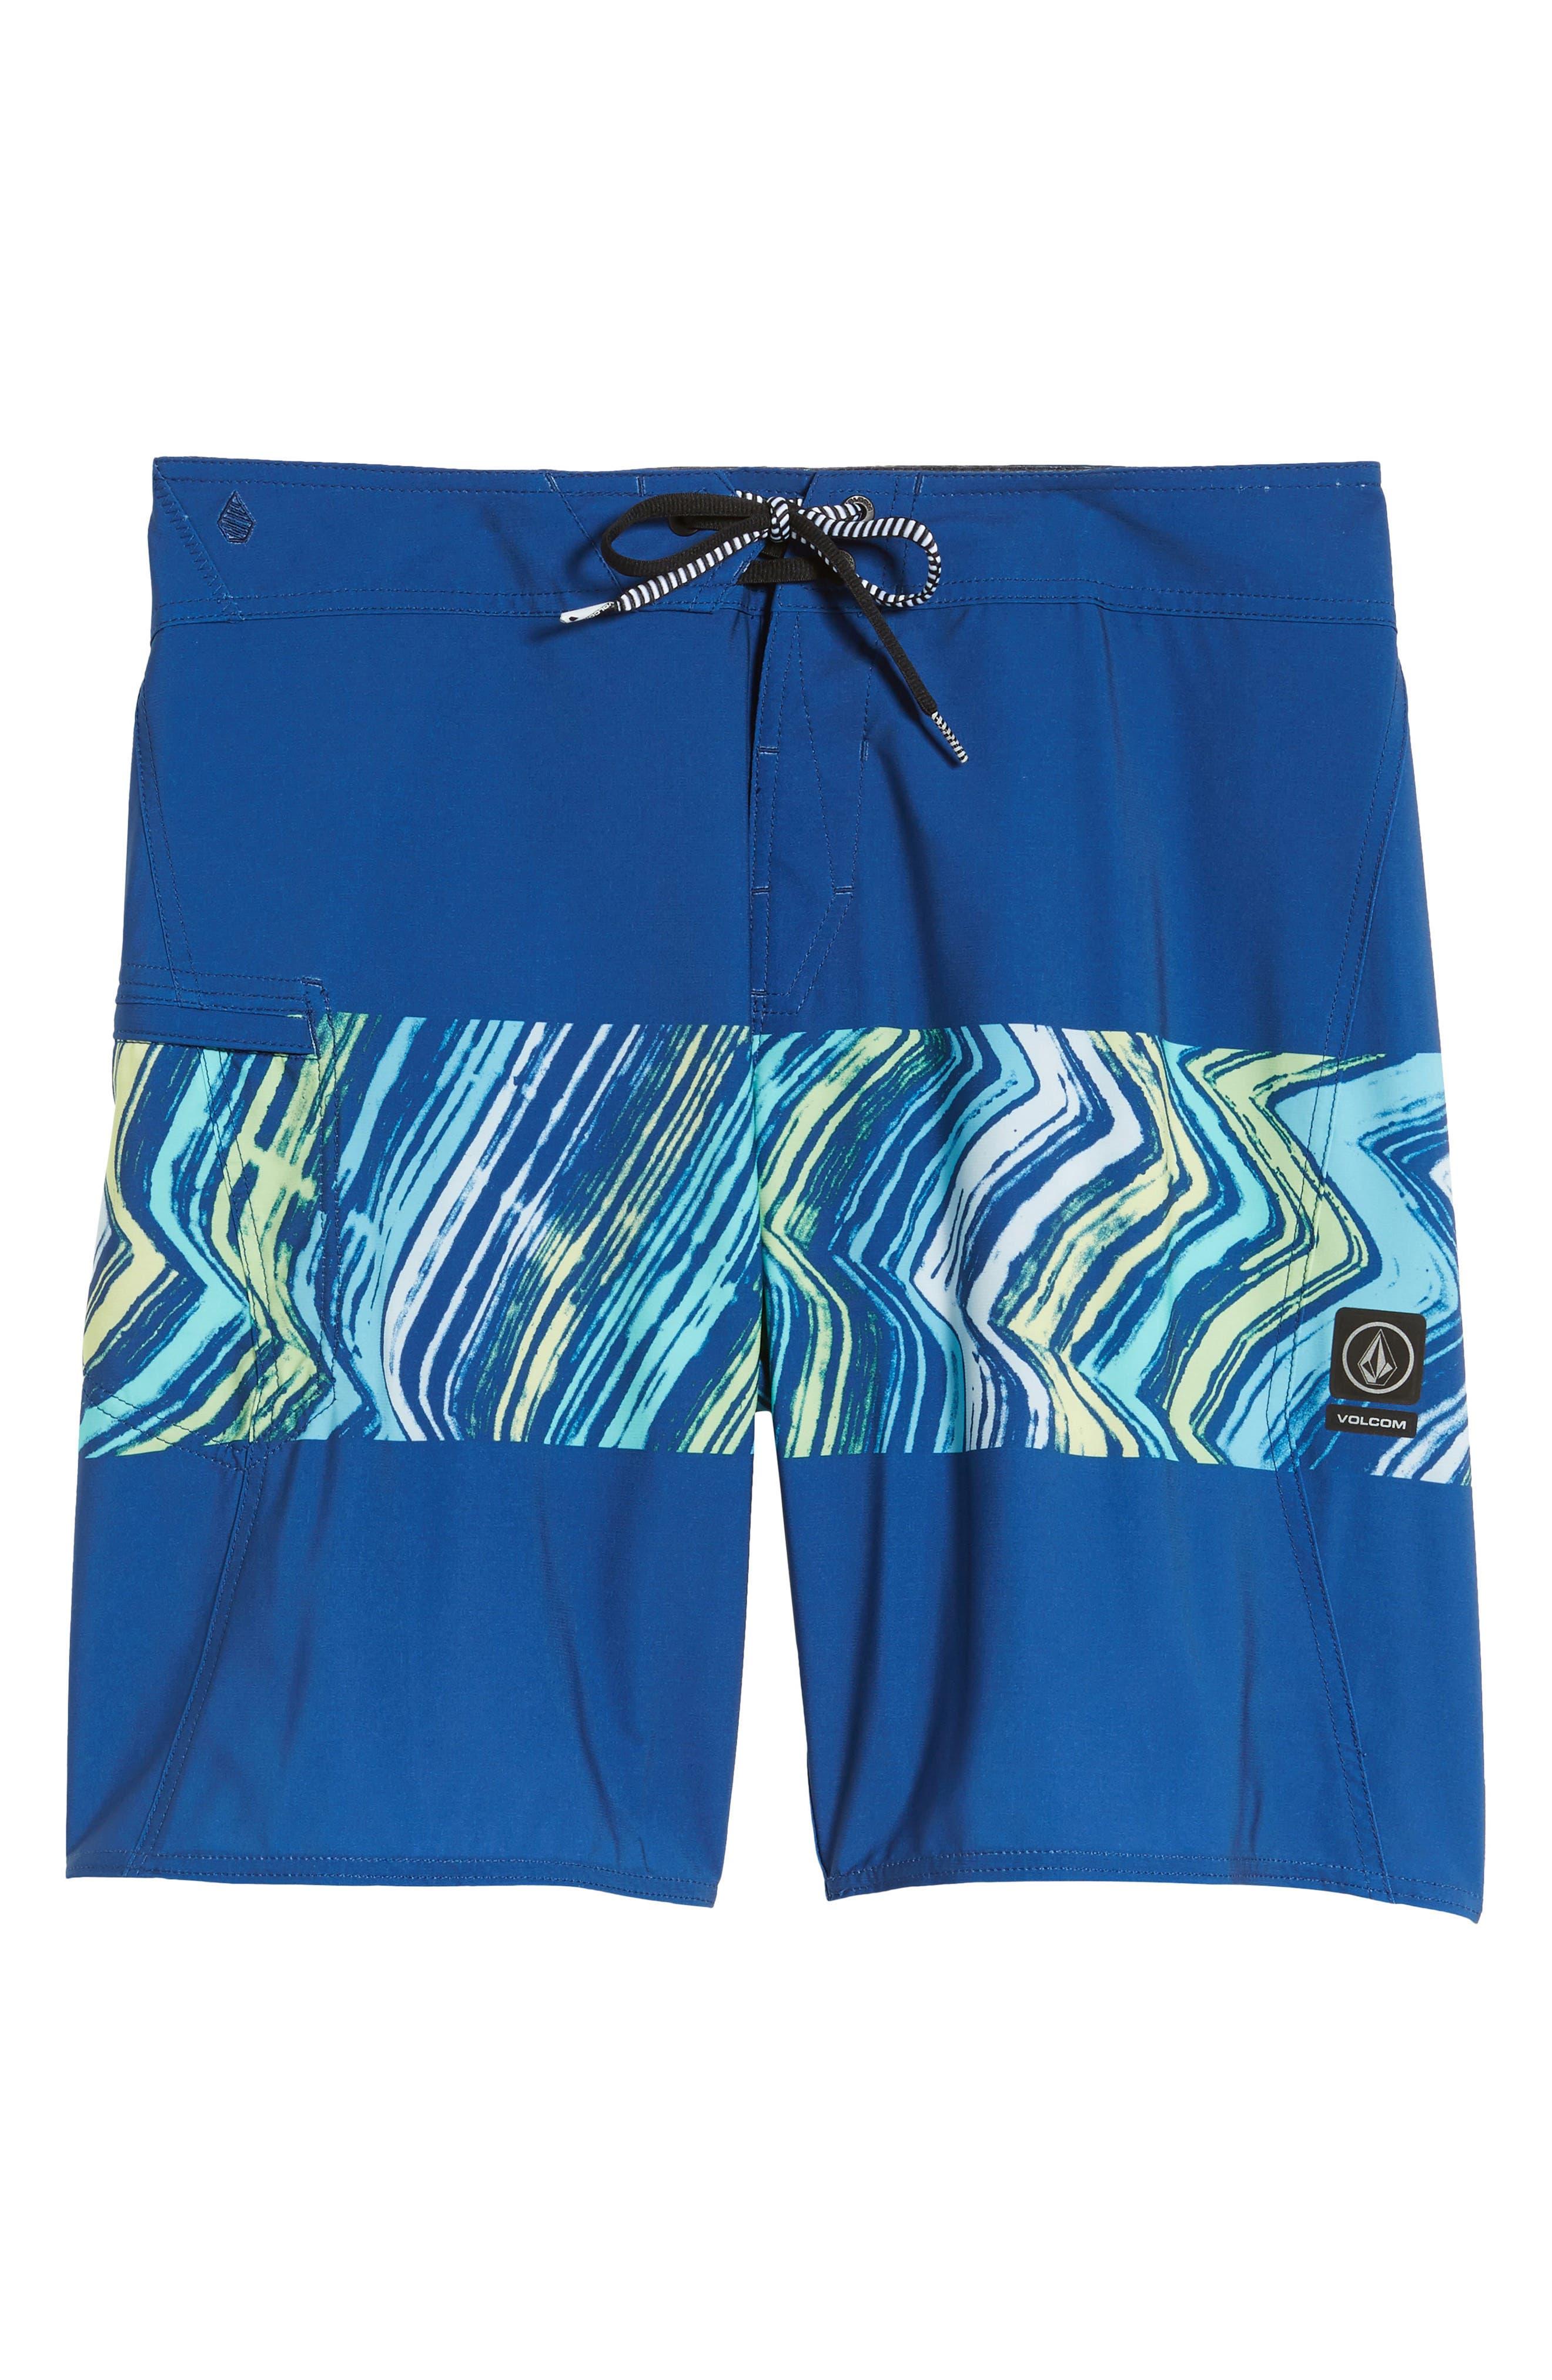 Macaw Board Shorts,                             Main thumbnail 1, color,                             CAMPER BLUE